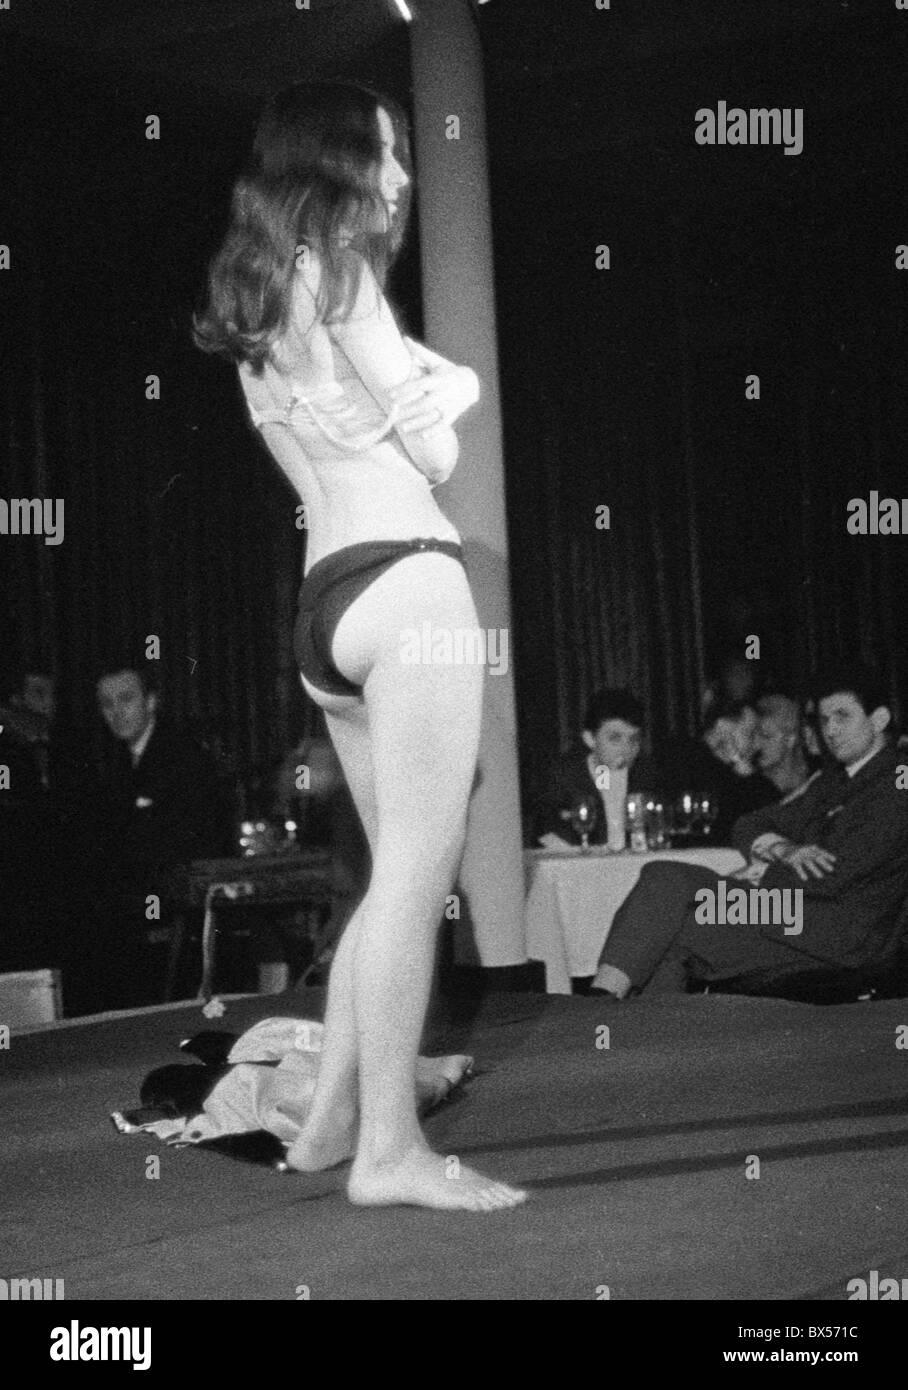 Frfree Striptease Show